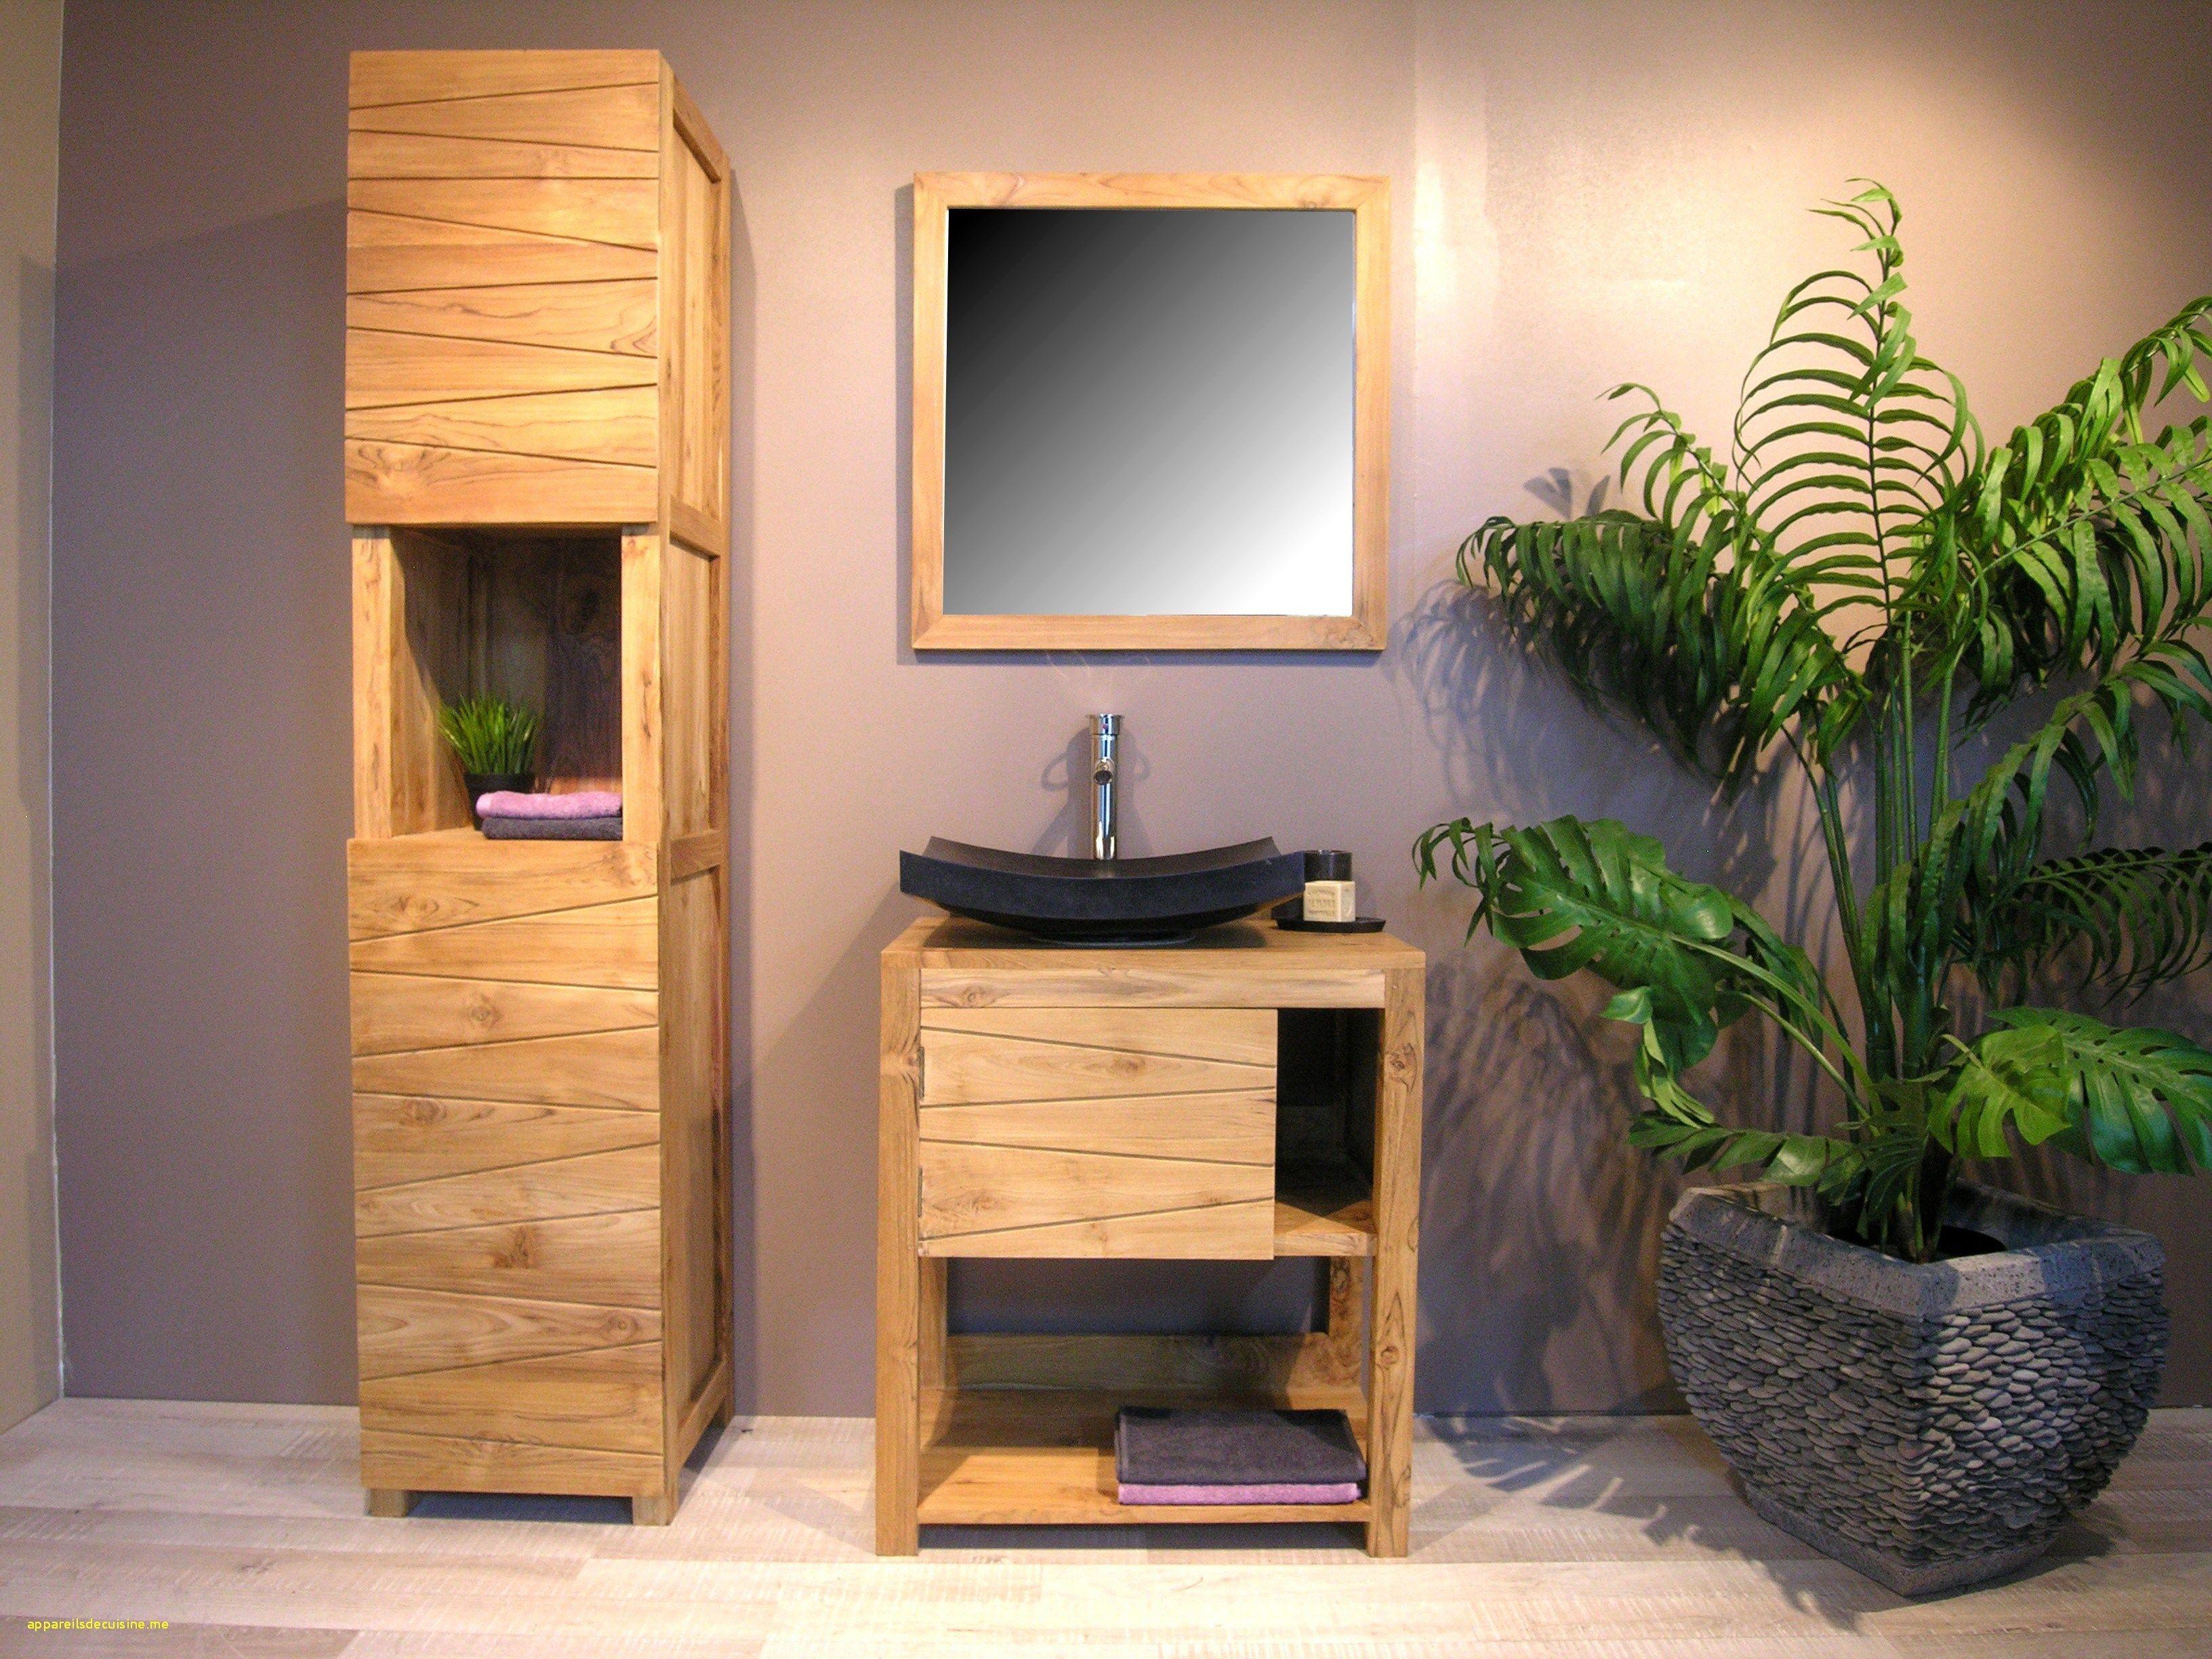 Best Of Bon Coin Ile De France Meuble White Bathroom Furniture Bathroom Bench Cheap Bathrooms